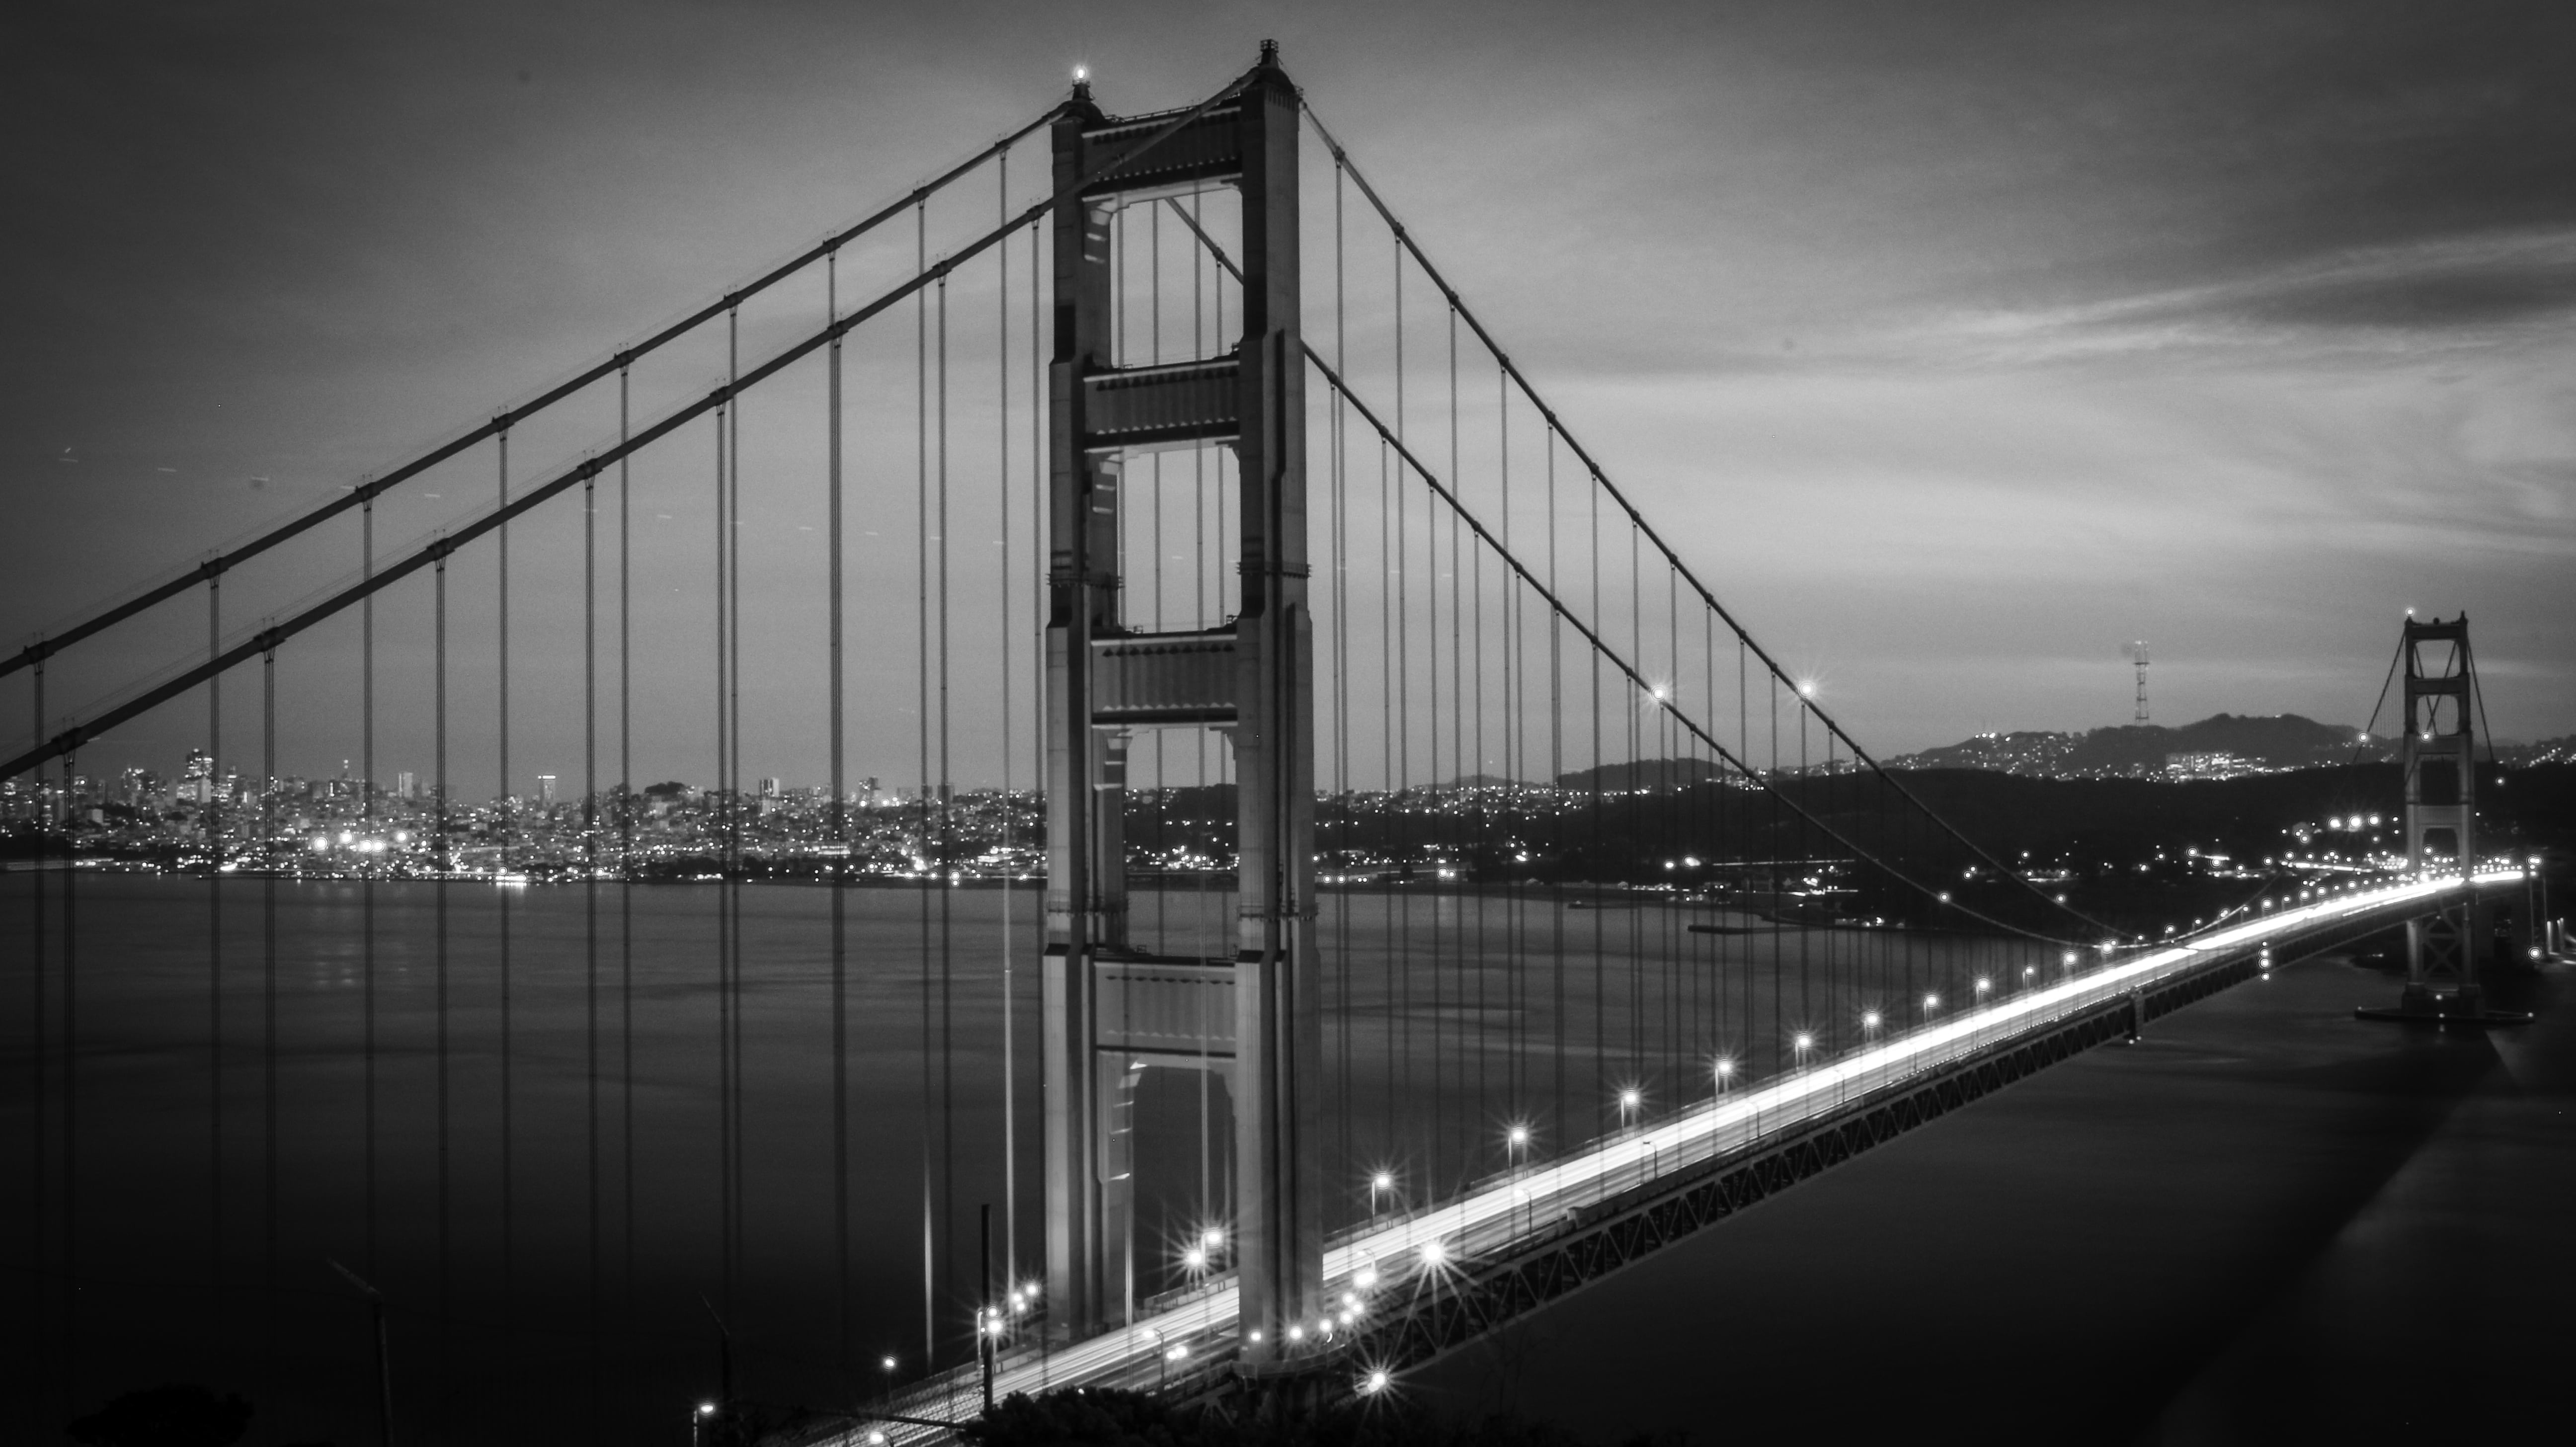 Golden Gate Bridge - Black and White